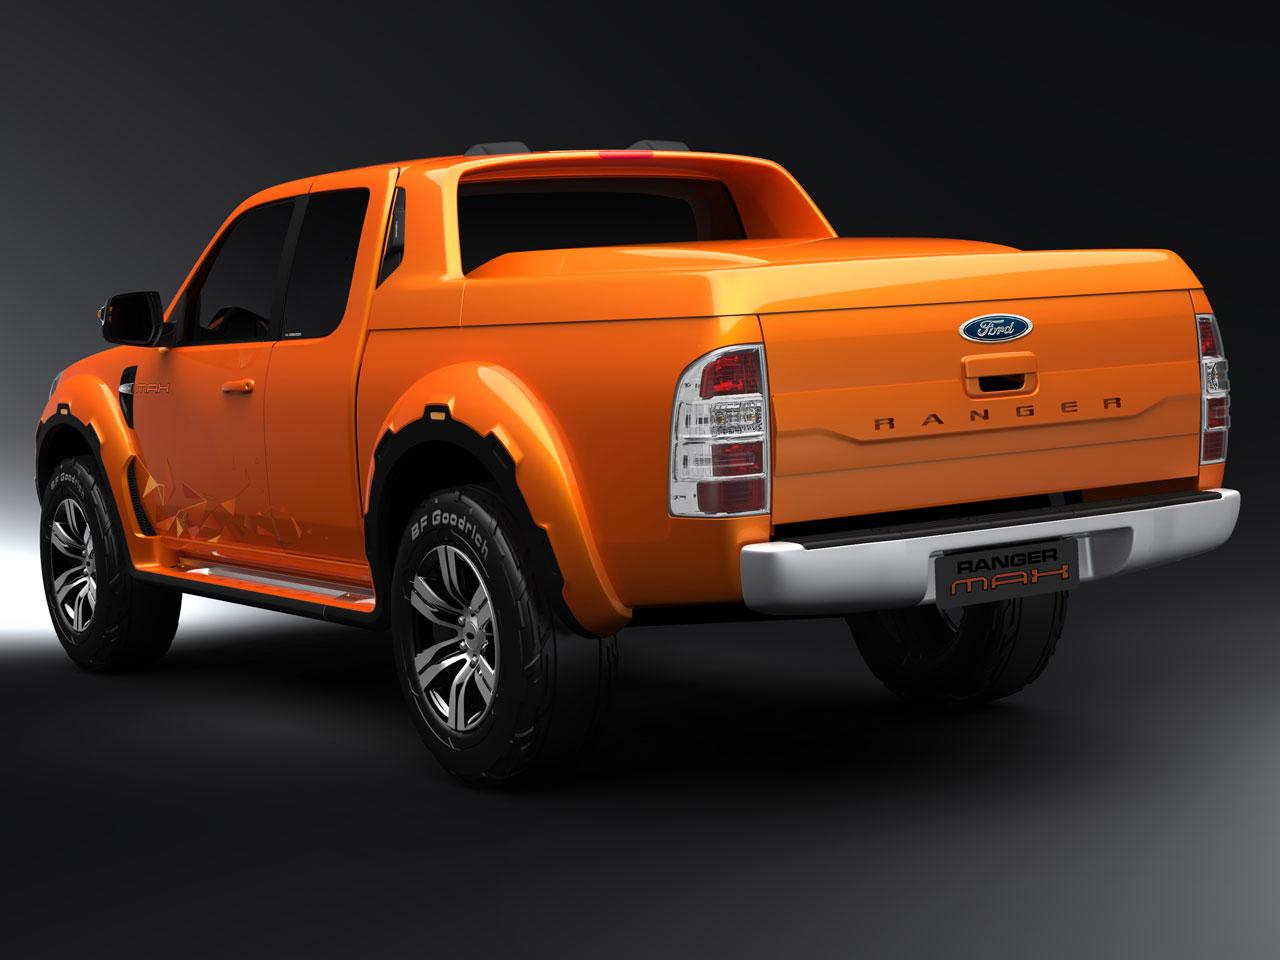 Ford Ranger Max Concept | Thaicardesign